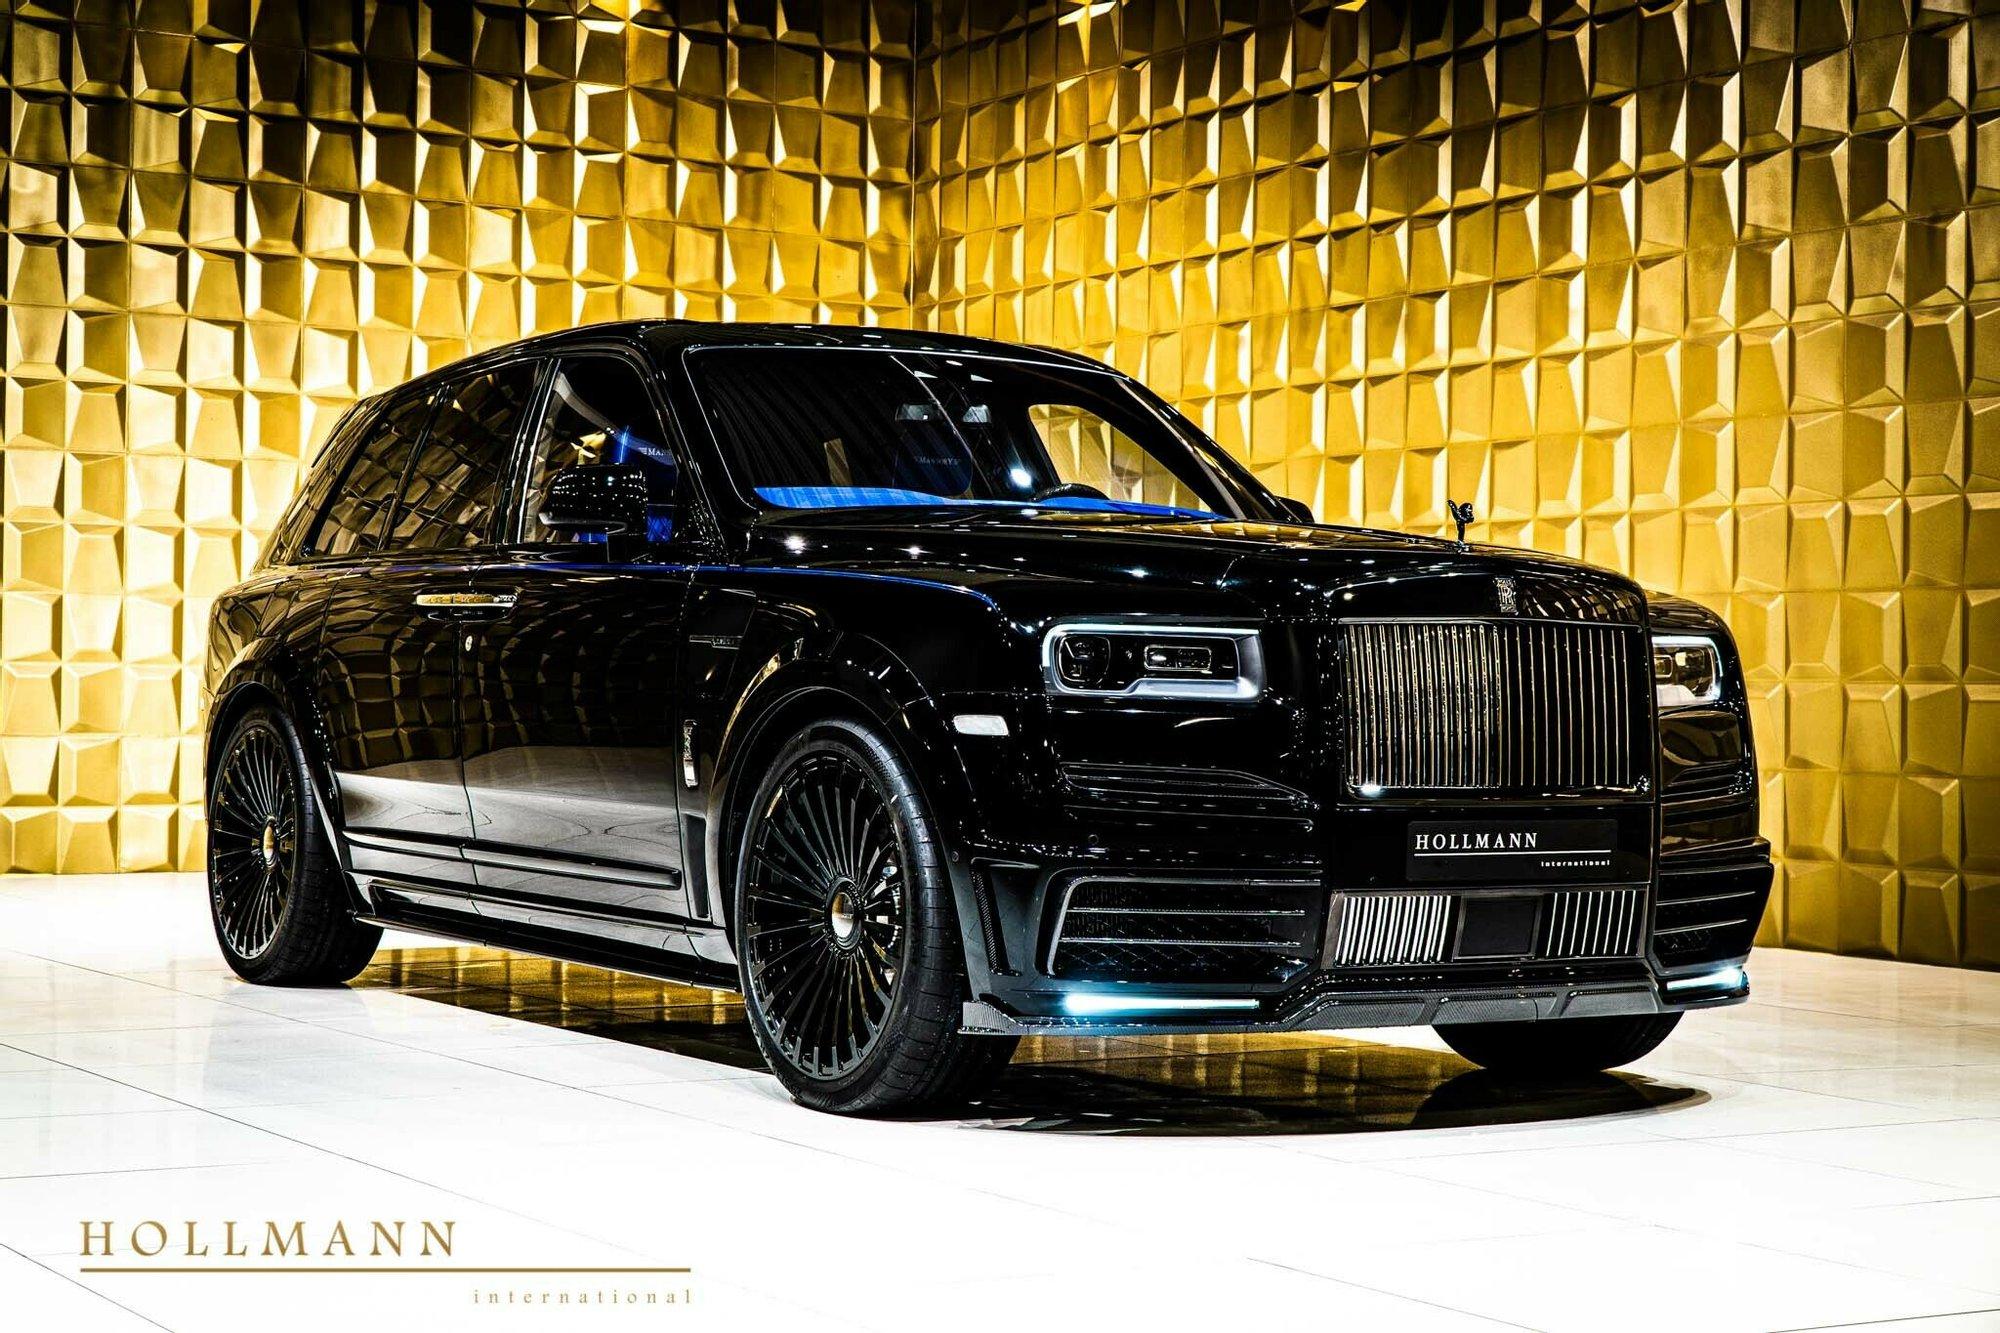 2021 Rolls Royce Cullinan In Stuhr Germany For Sale 11252147